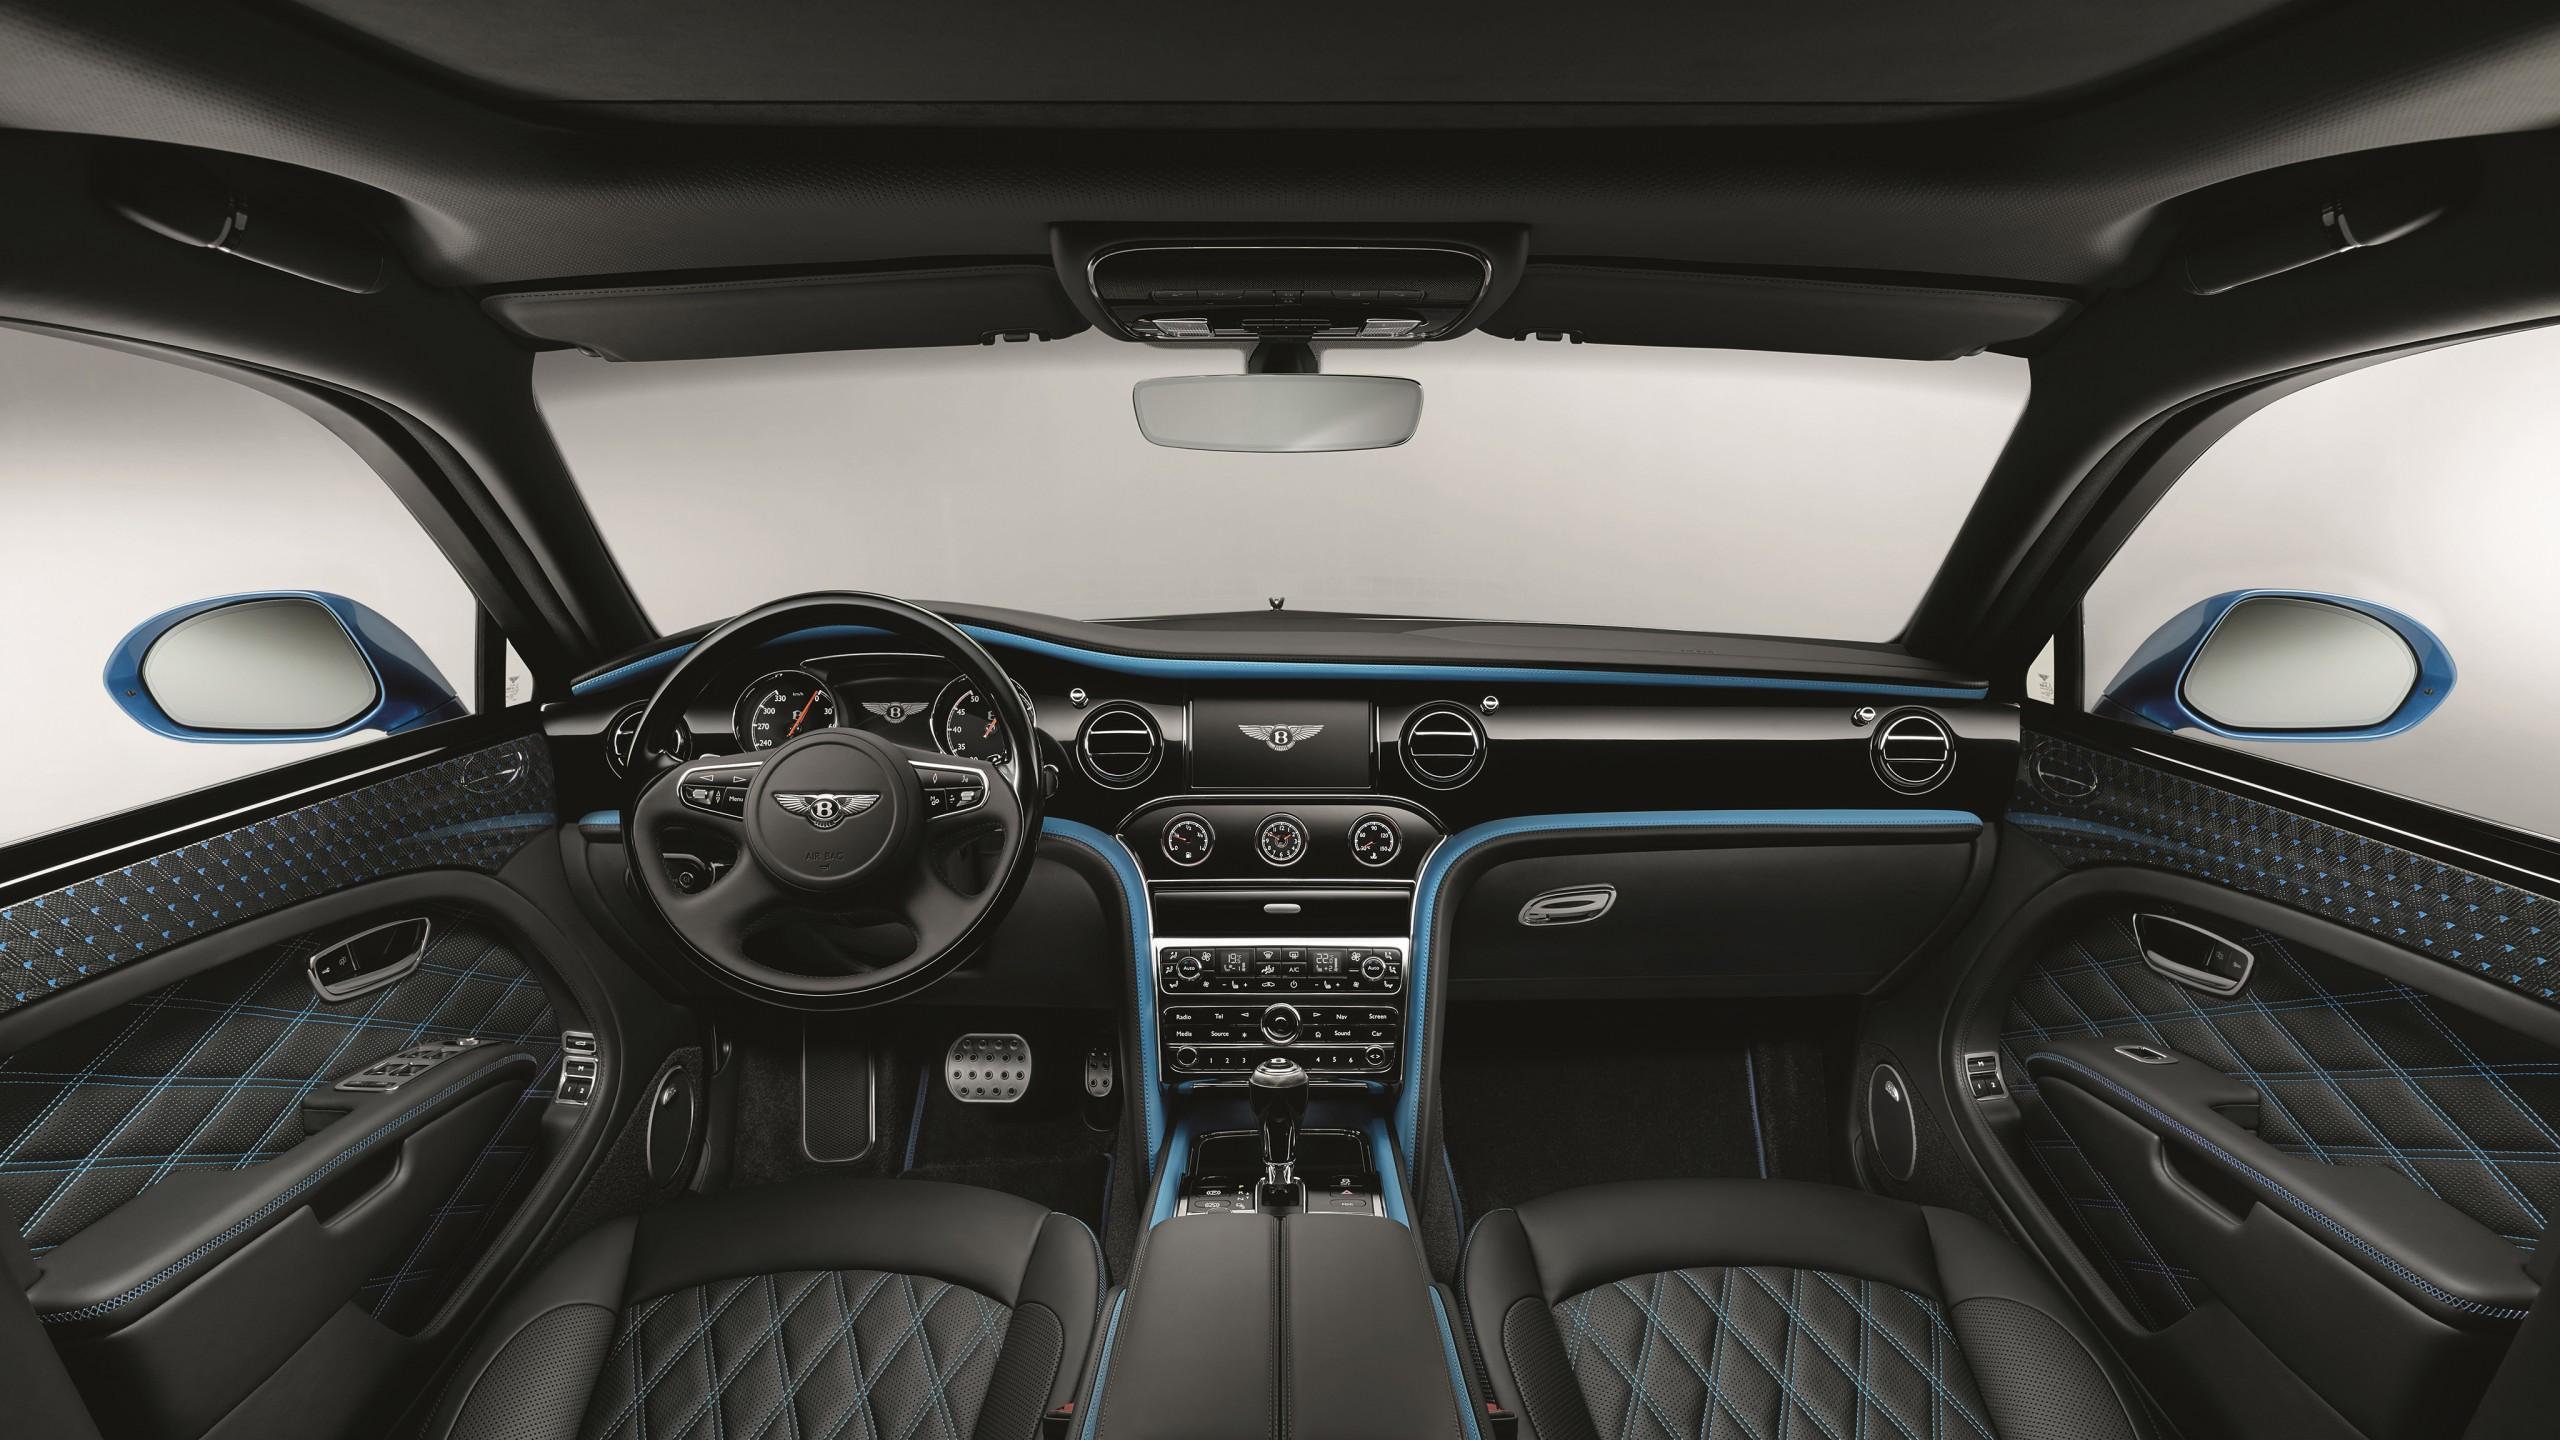 2017 Bentley Continental Gt Convertible >> 2018 Bentley Mulsanne Speed Design Series Interior Wallpaper | HD Car Wallpapers | ID #8472